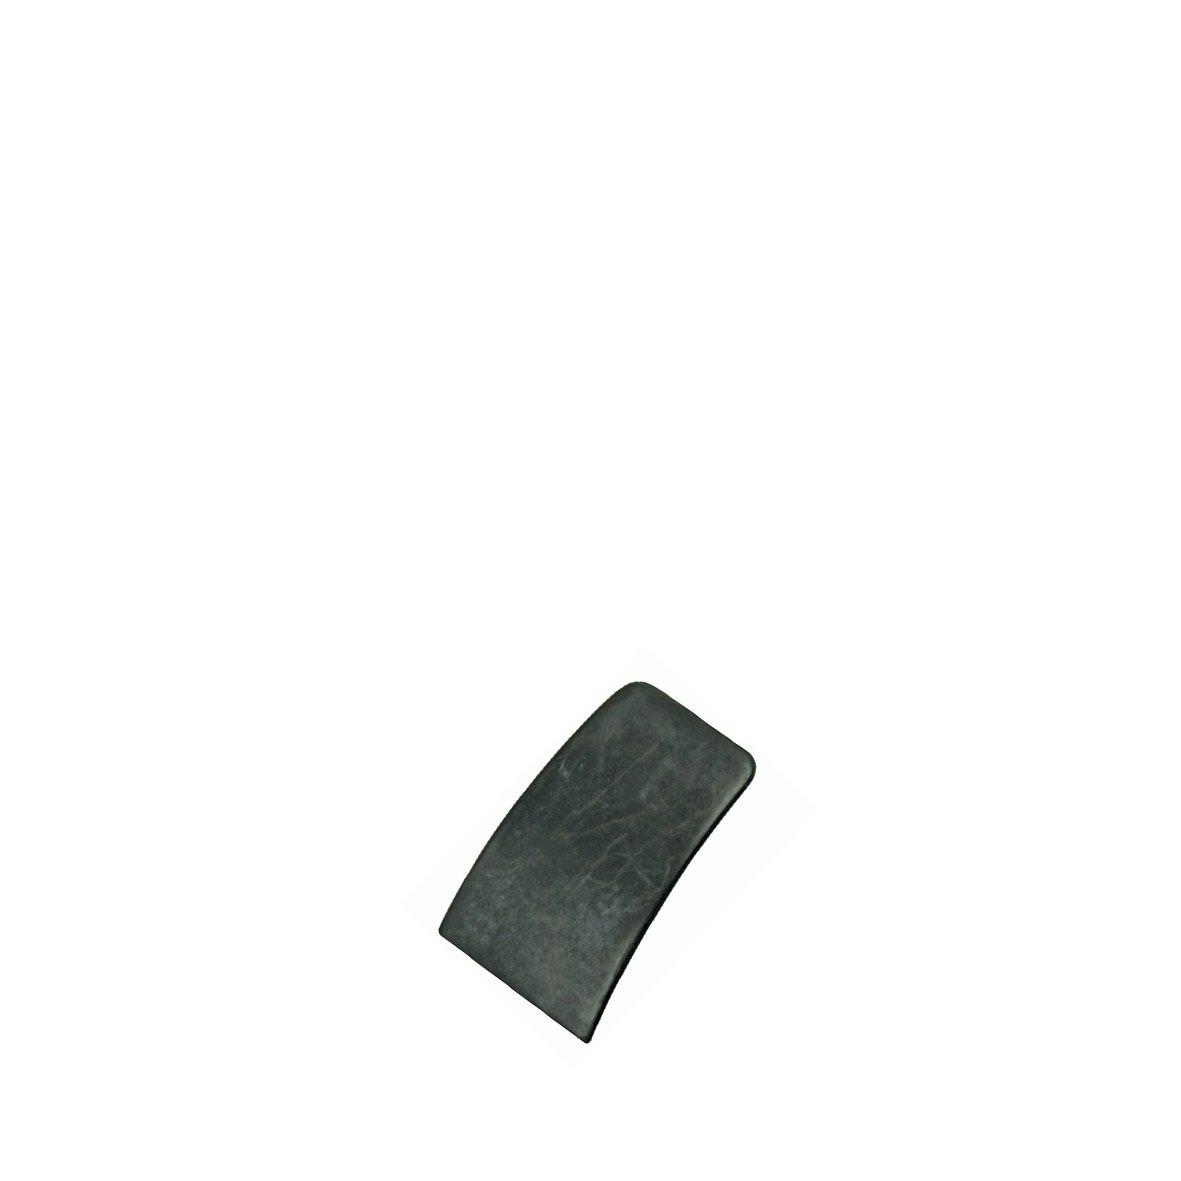 Knebelfeder Blattfeder Knebel Herd Backofen AEG Electrolux 899661301300 Europart